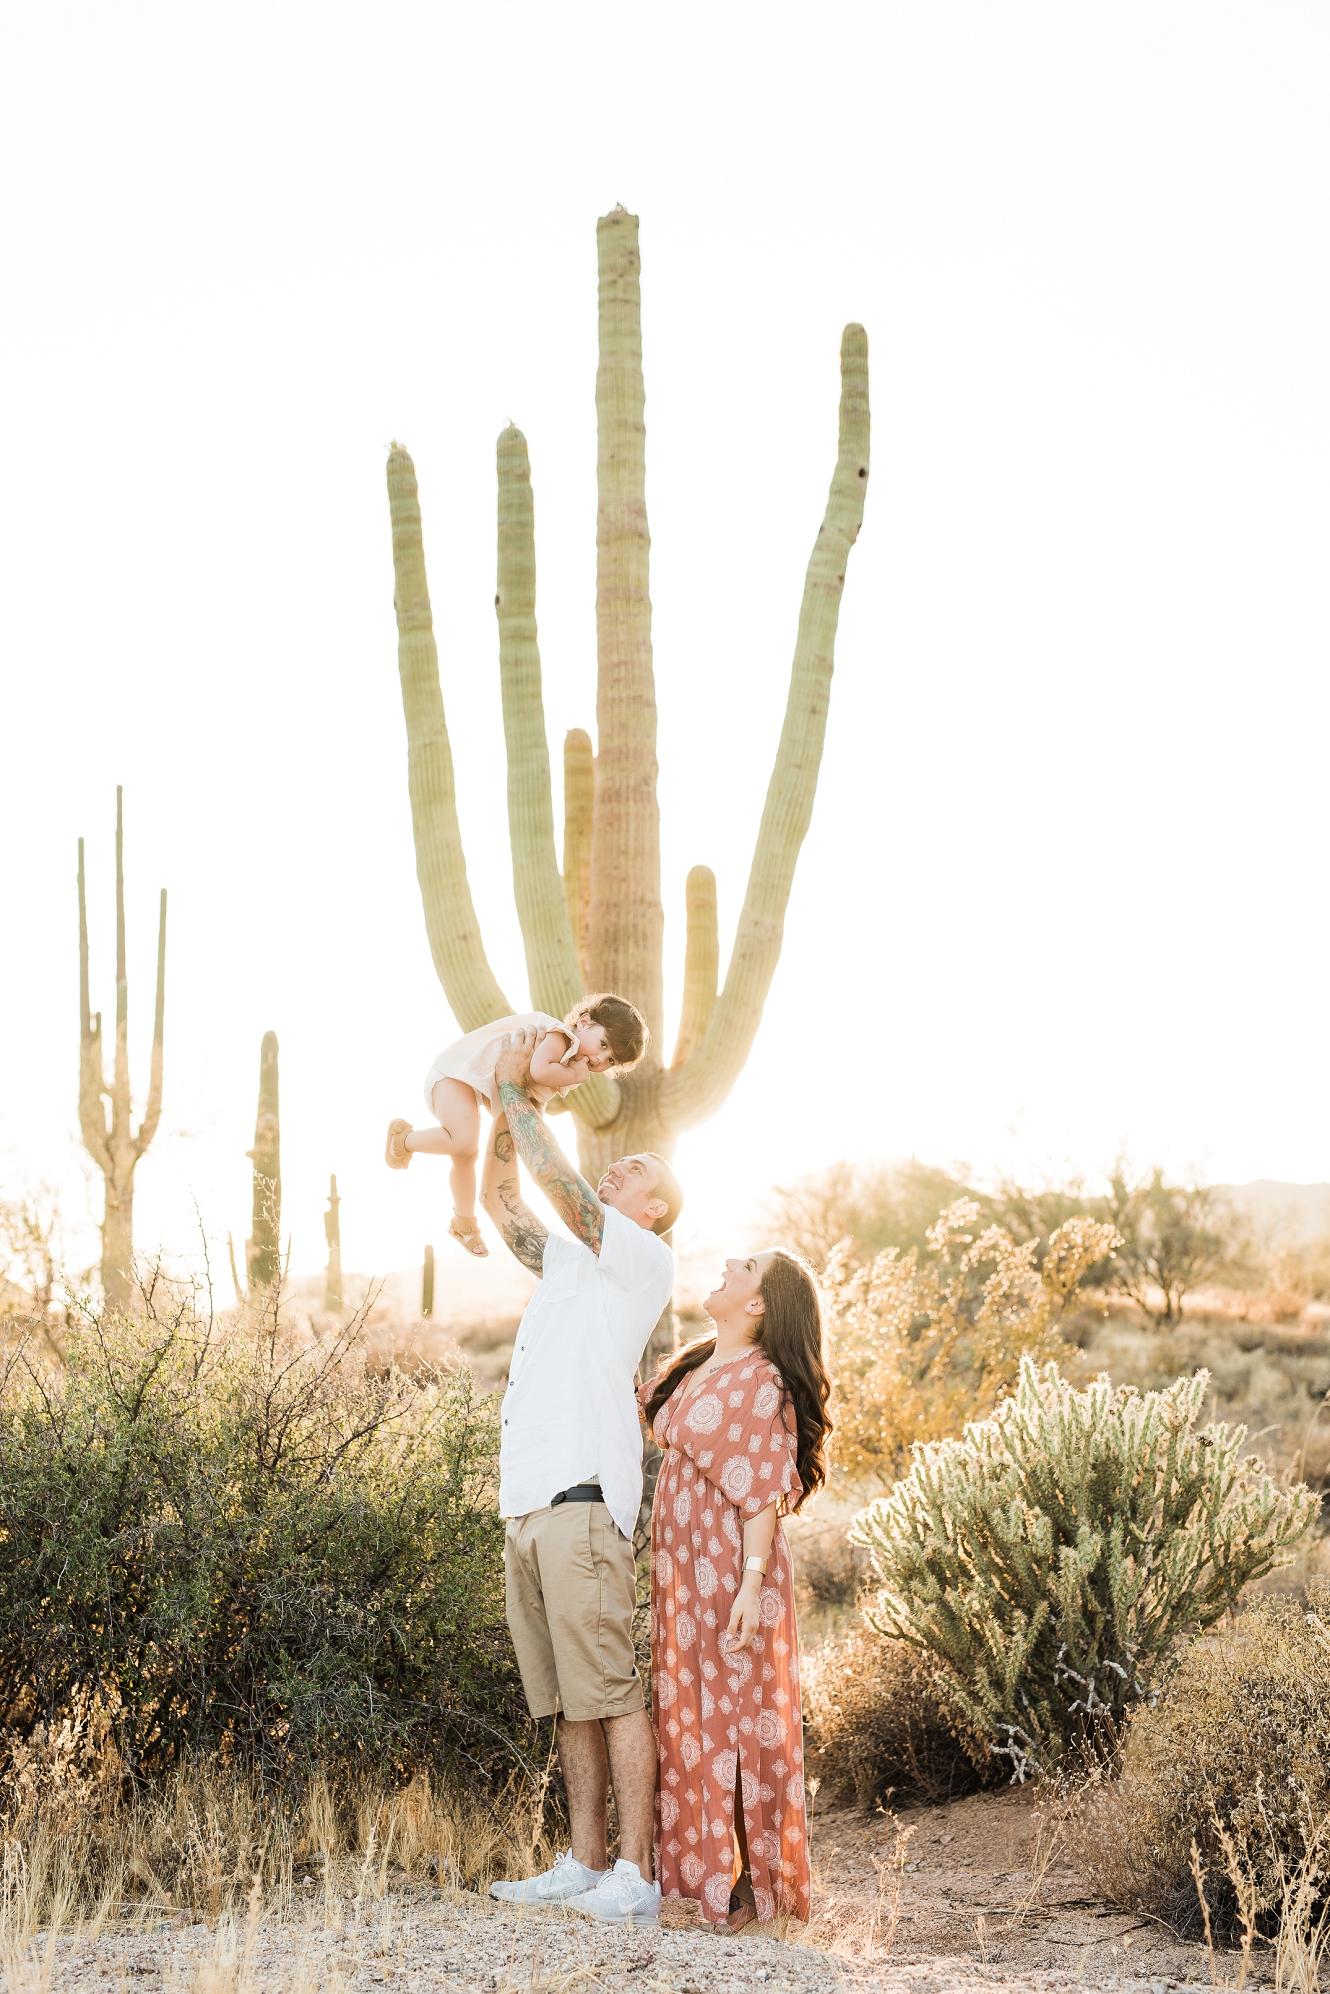 Lindsay-Borg-Photography-Arizona_2498.jpg